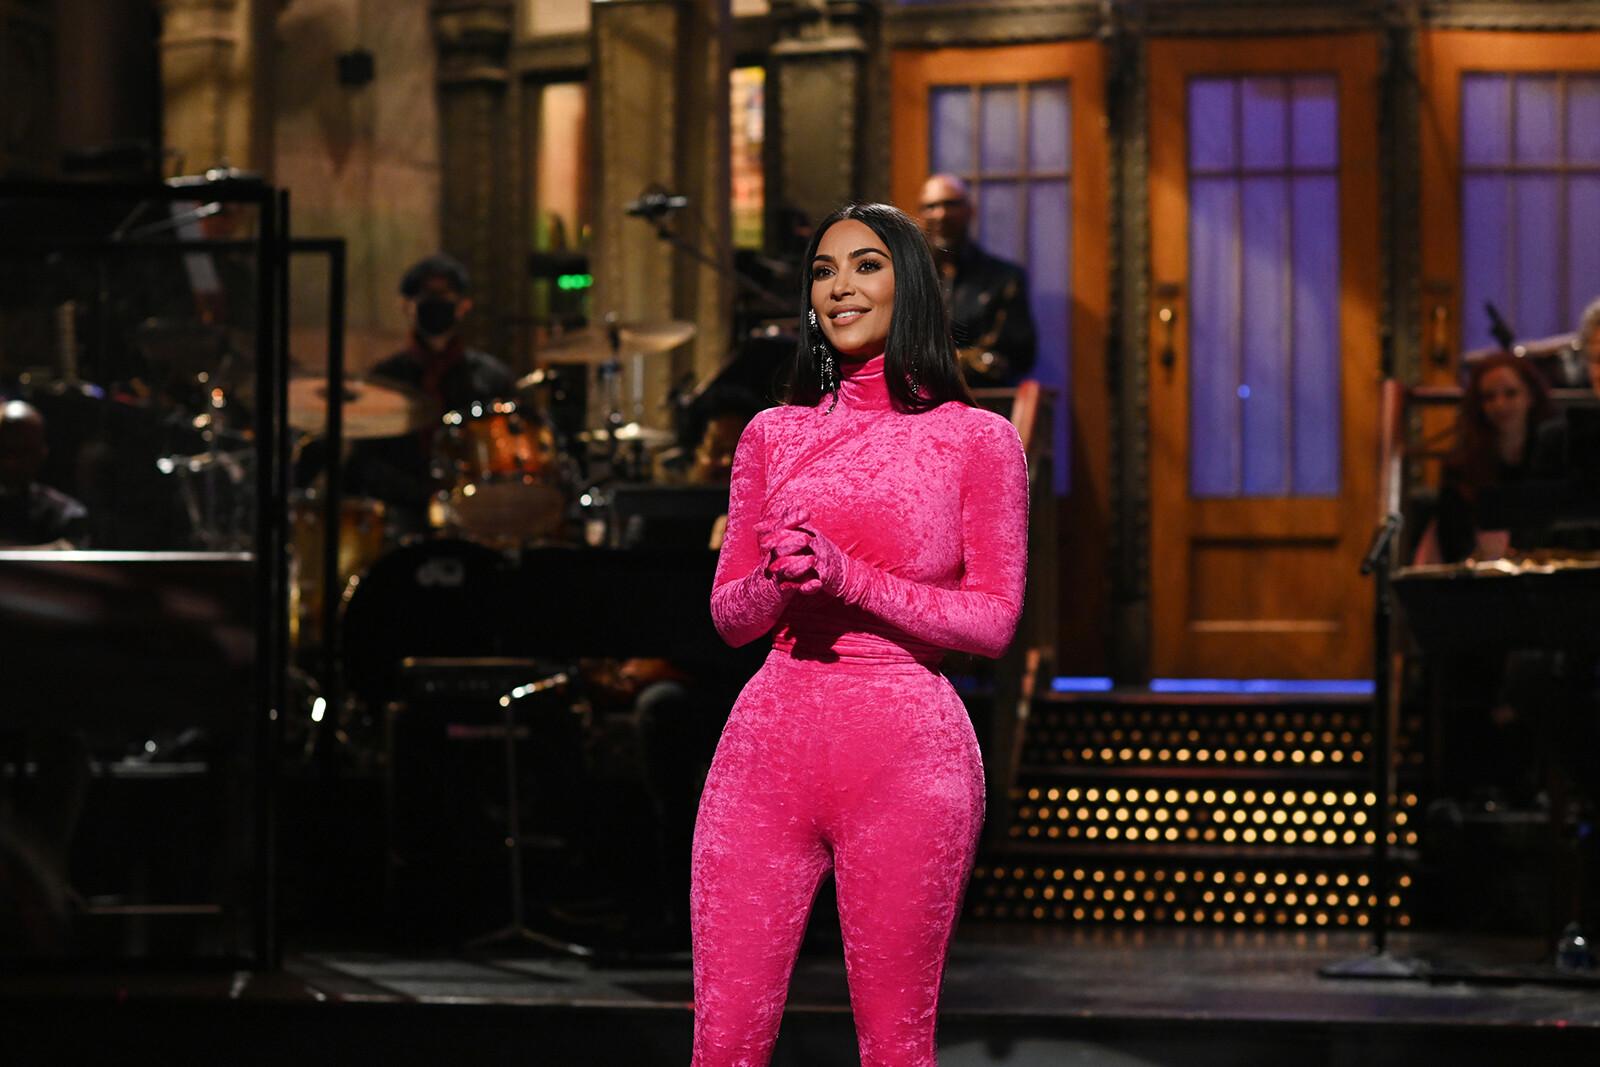 Kim Kardashian West on 'SNL': Her funniest moments